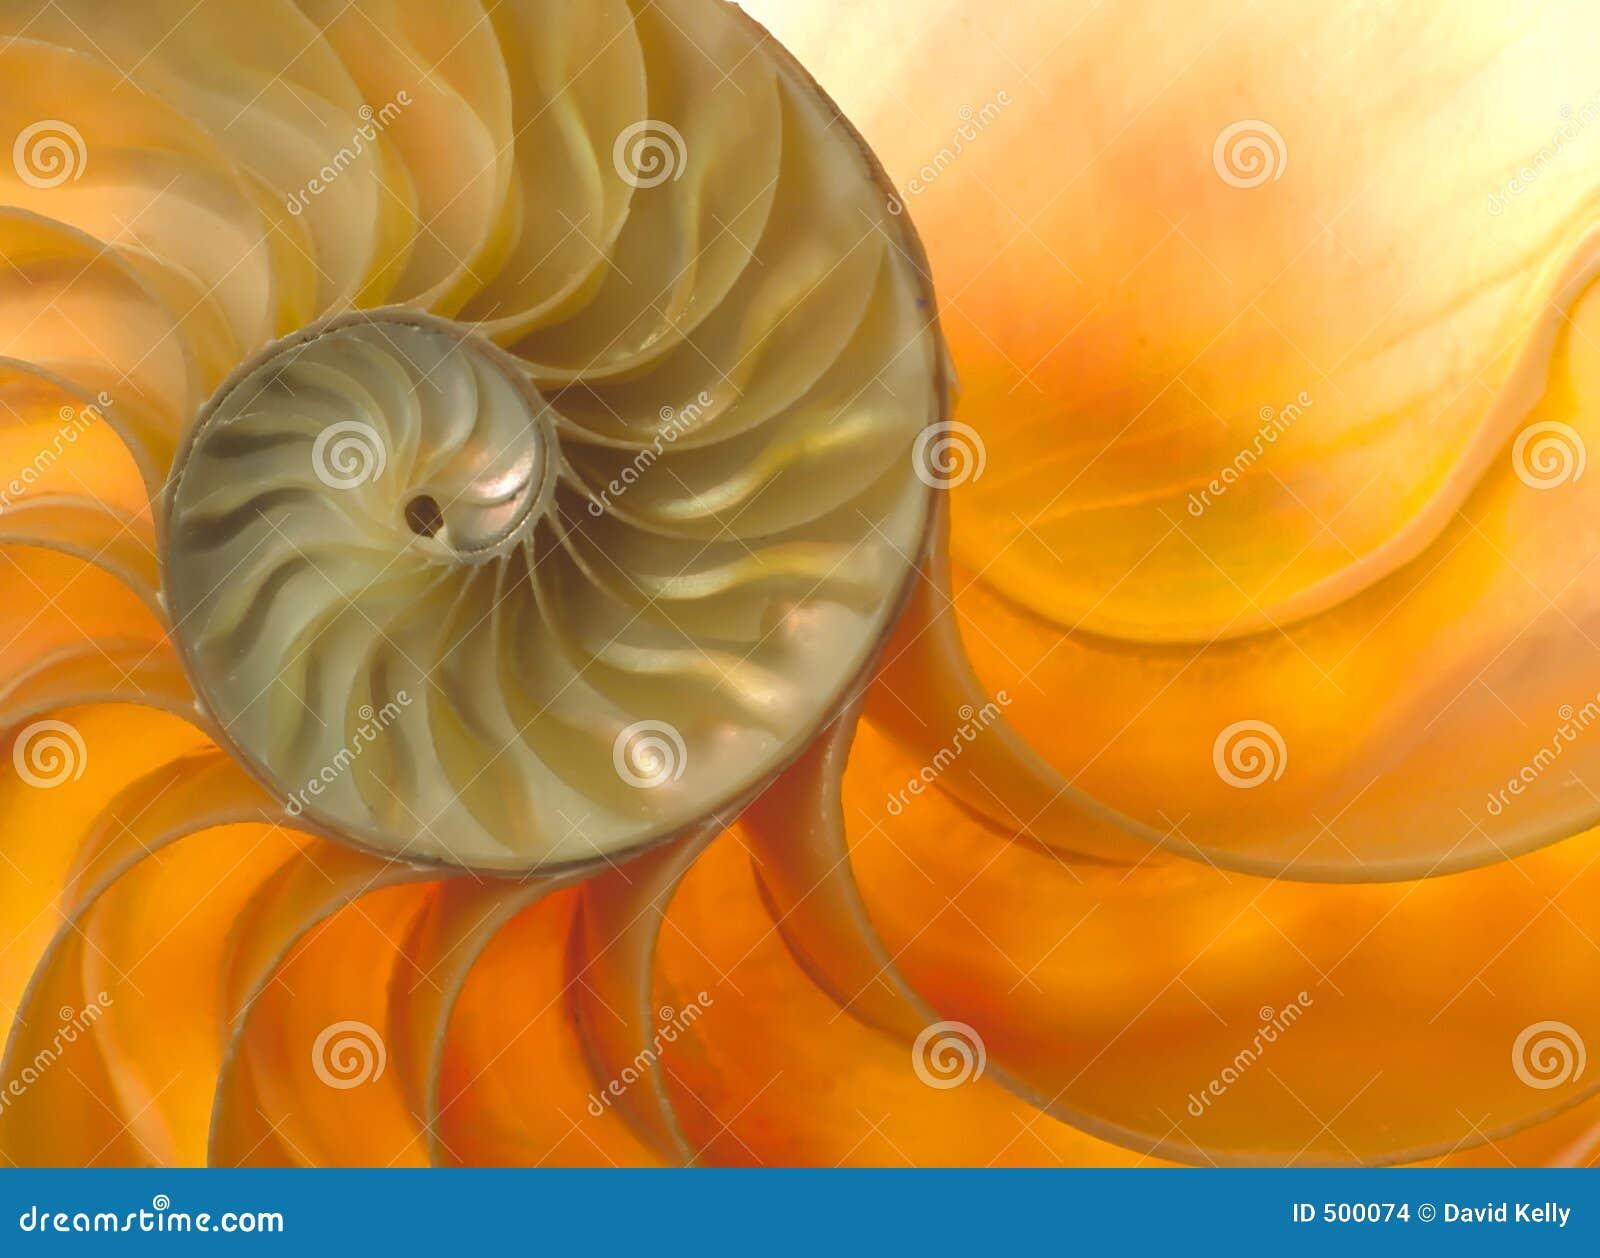 Nautilaus shell